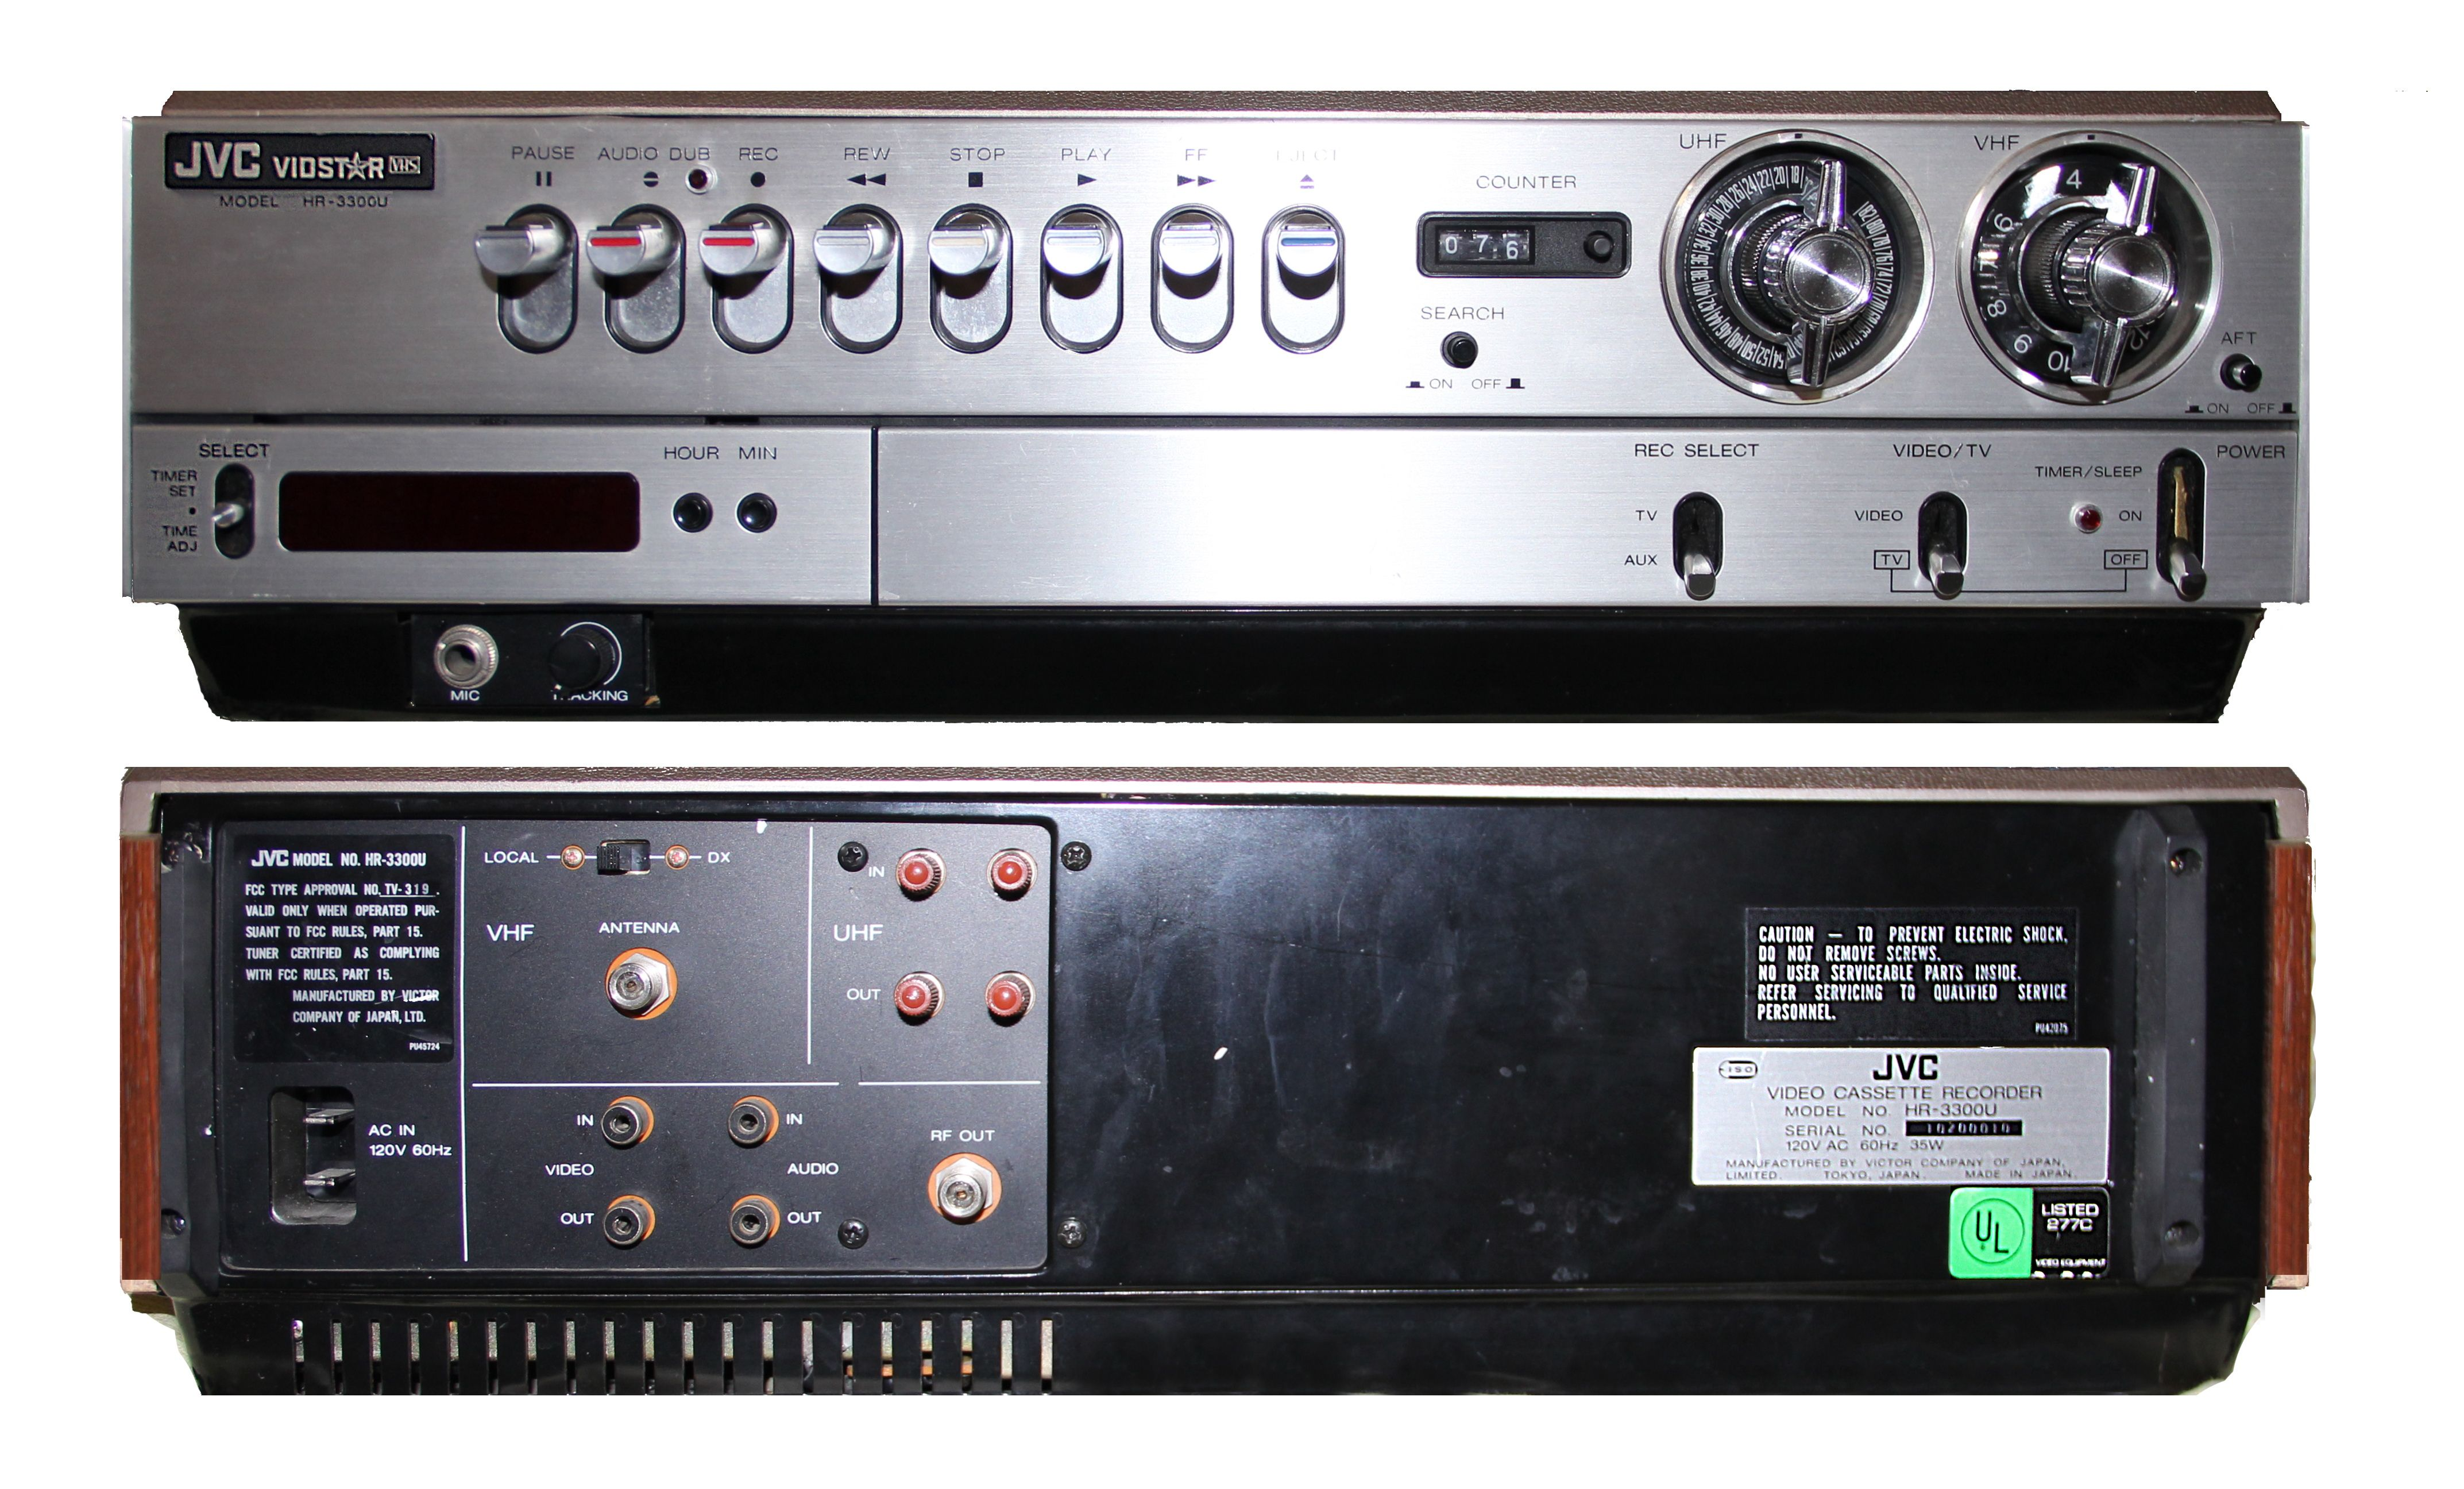 jvc hr 3300u jpg 4290 2592 hi fi videophile pinterest rh pinterest com jvc video cassette recorder manual jvc video recorder user manual